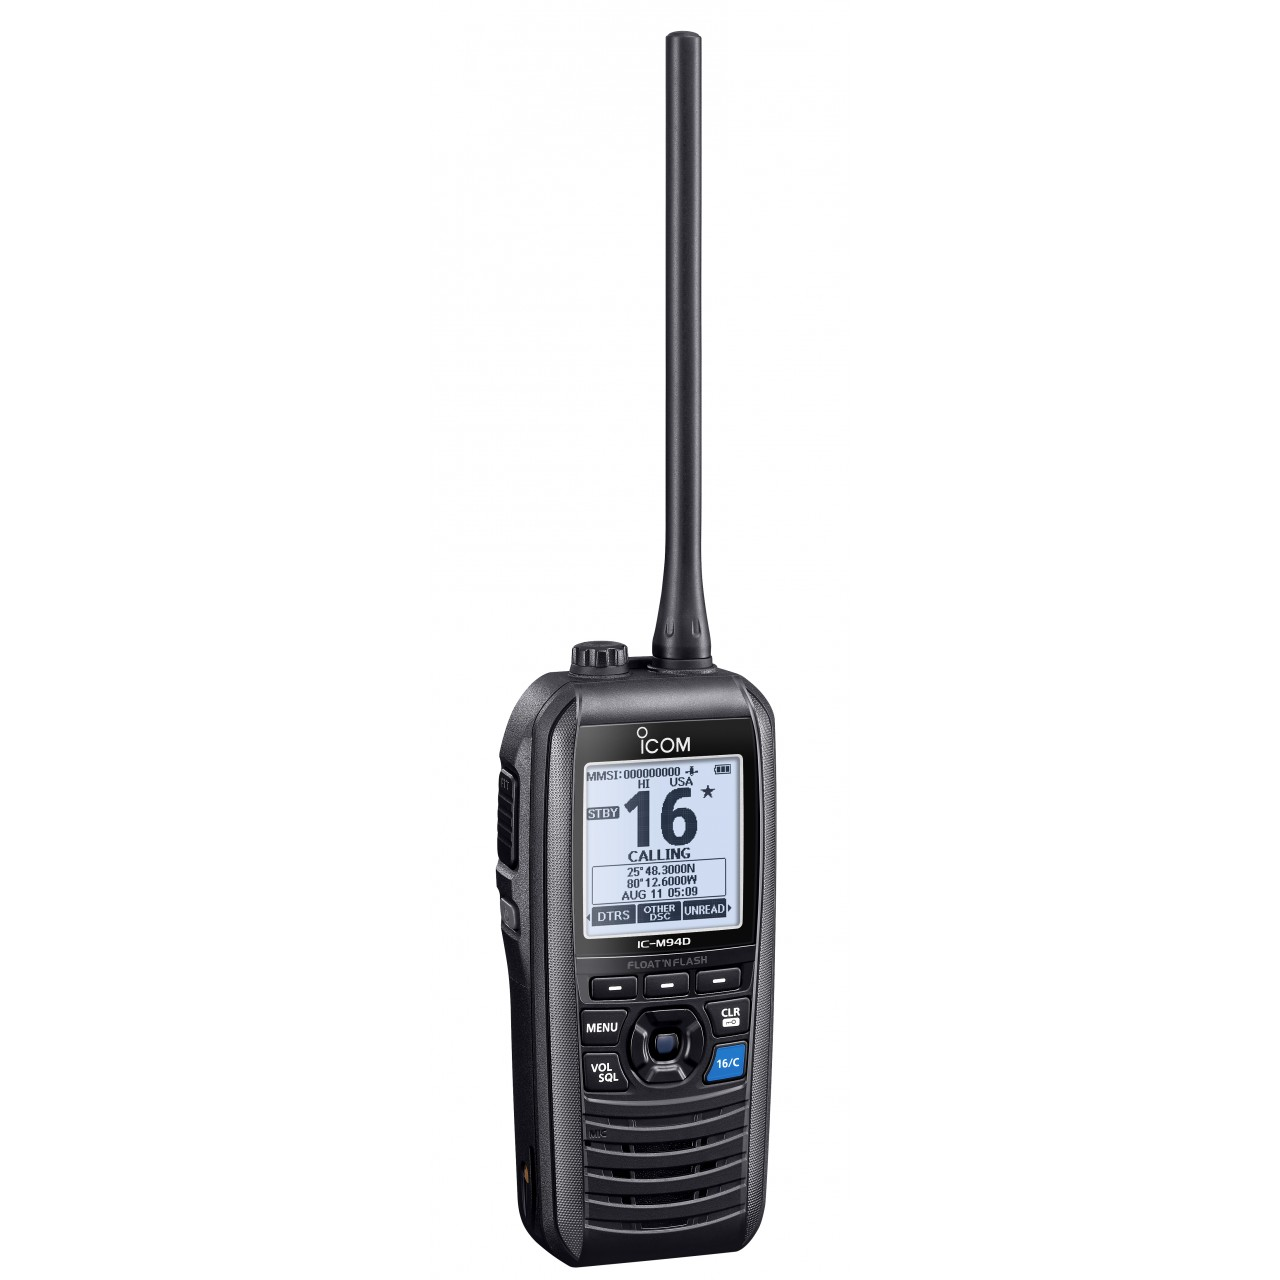 Portatif marine VHF 156-163.275MHz, 6W IC-M94DE